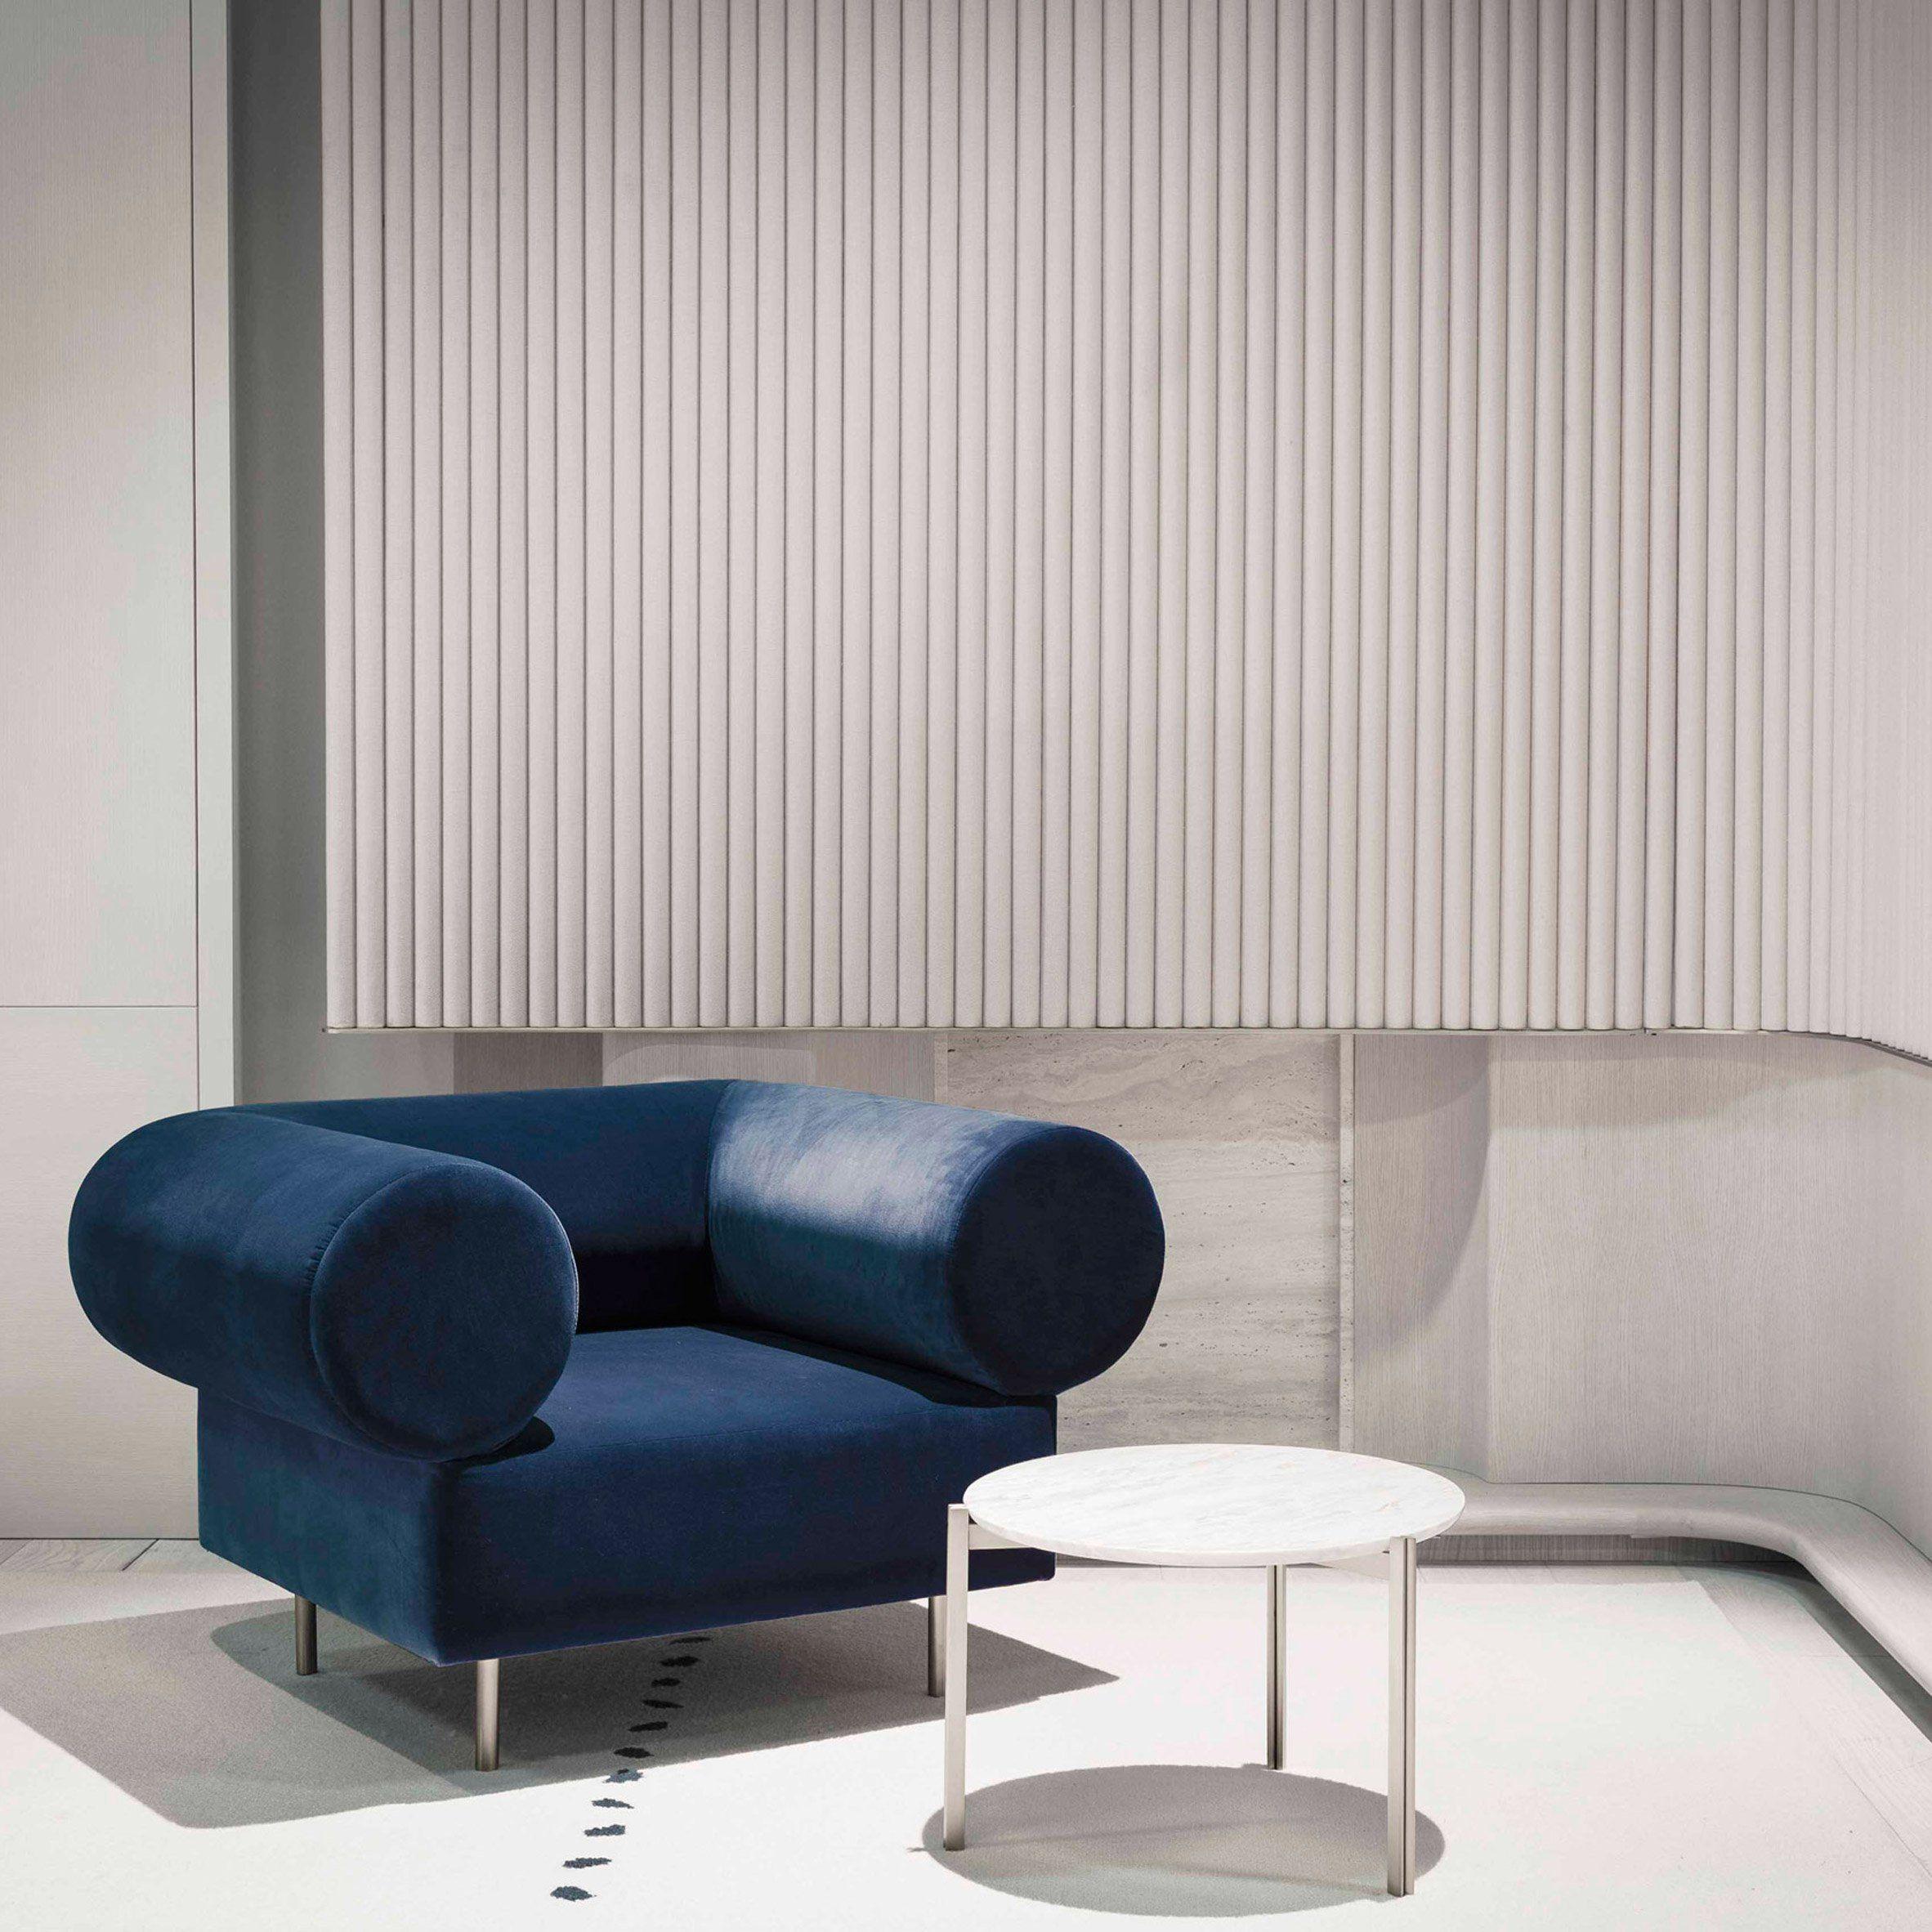 Editions by Studio Paolo Ferrari FURNISH sit